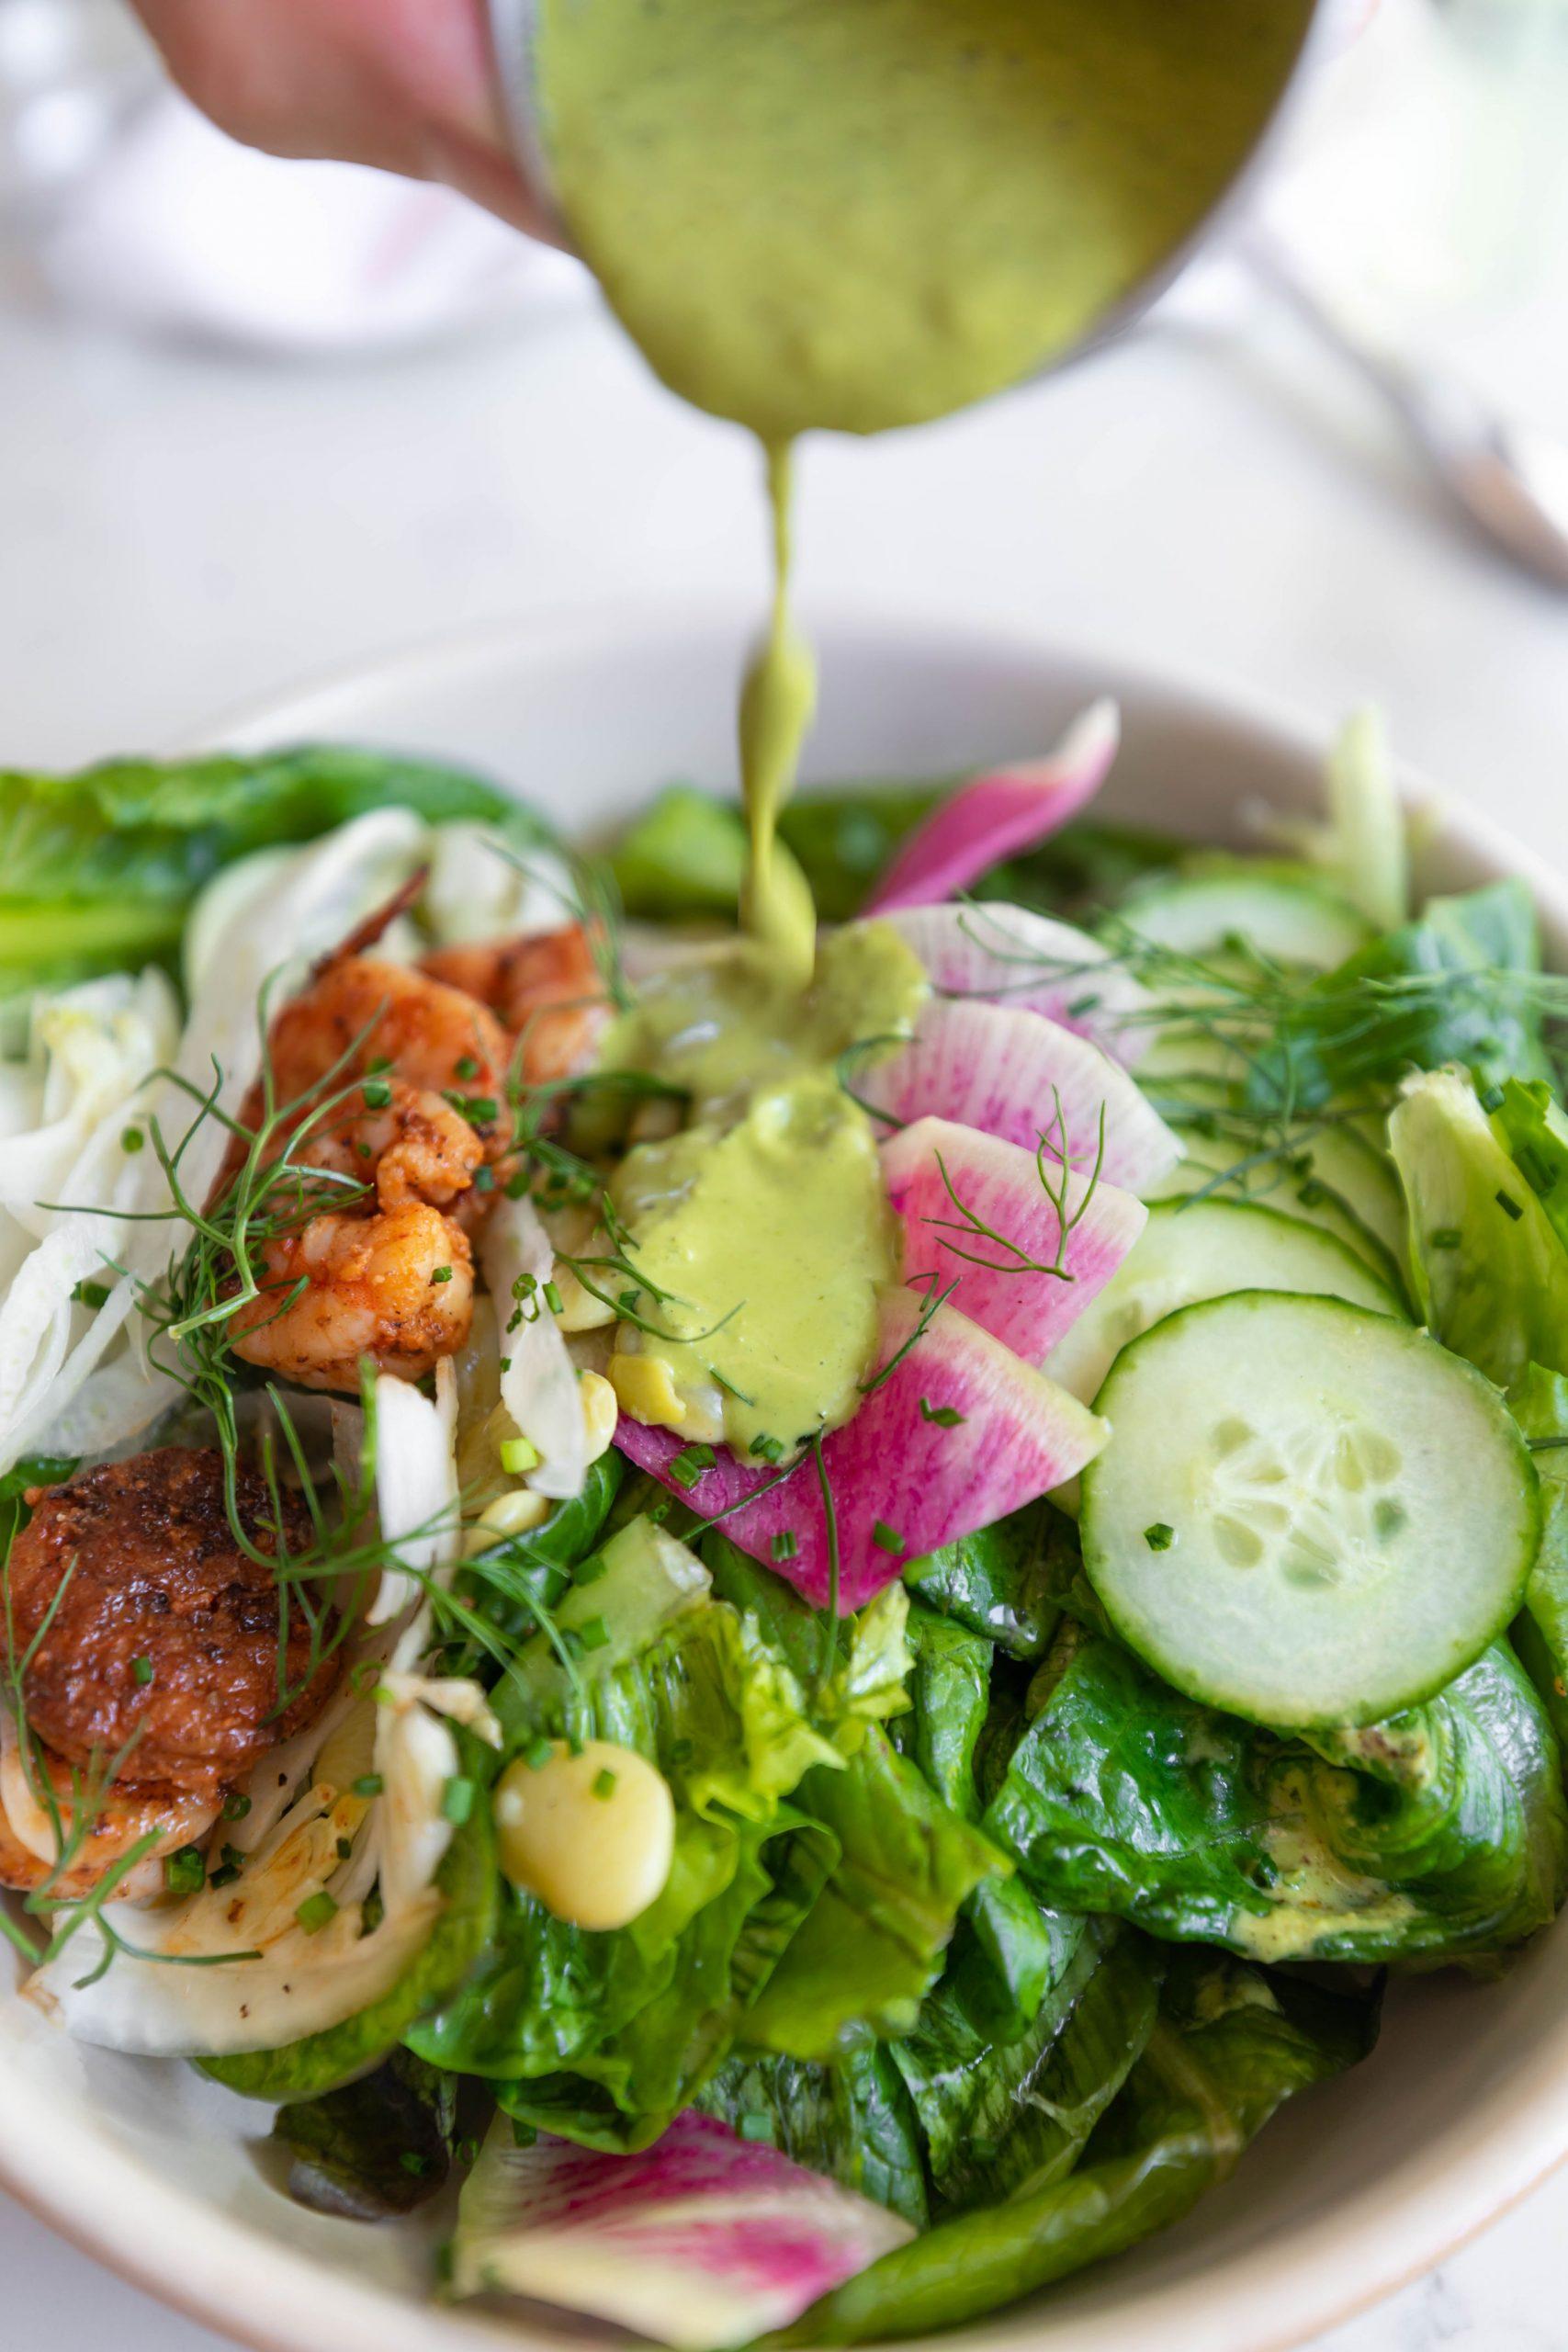 Local Shrimp & Veggie Salad from Basic Kitchen in Charleston South Carolina Plant Based Seasonal Local Cuisine Photographed by Annie Fairfax